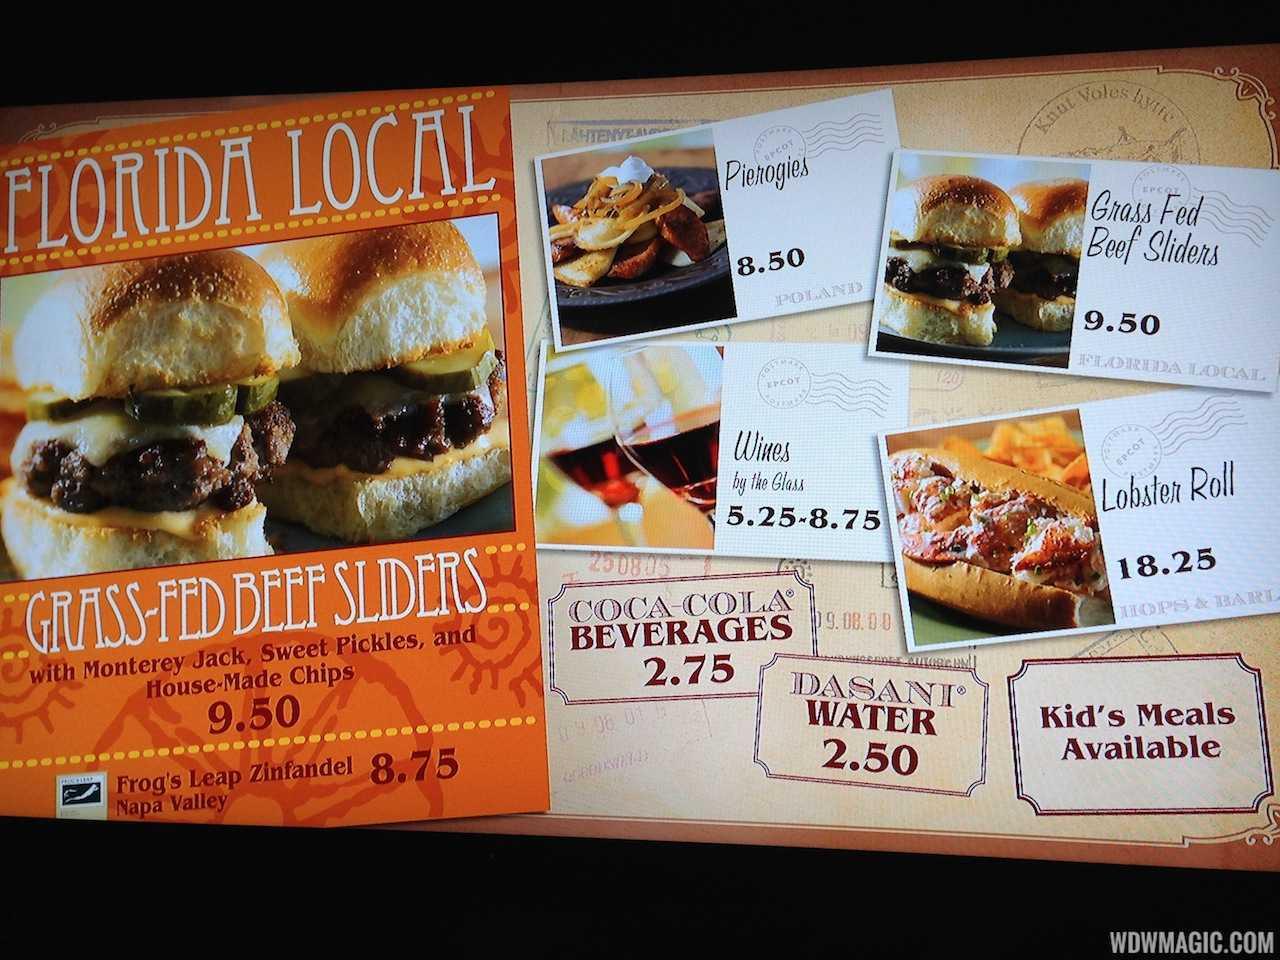 World Showcase of Flavors food truck menu